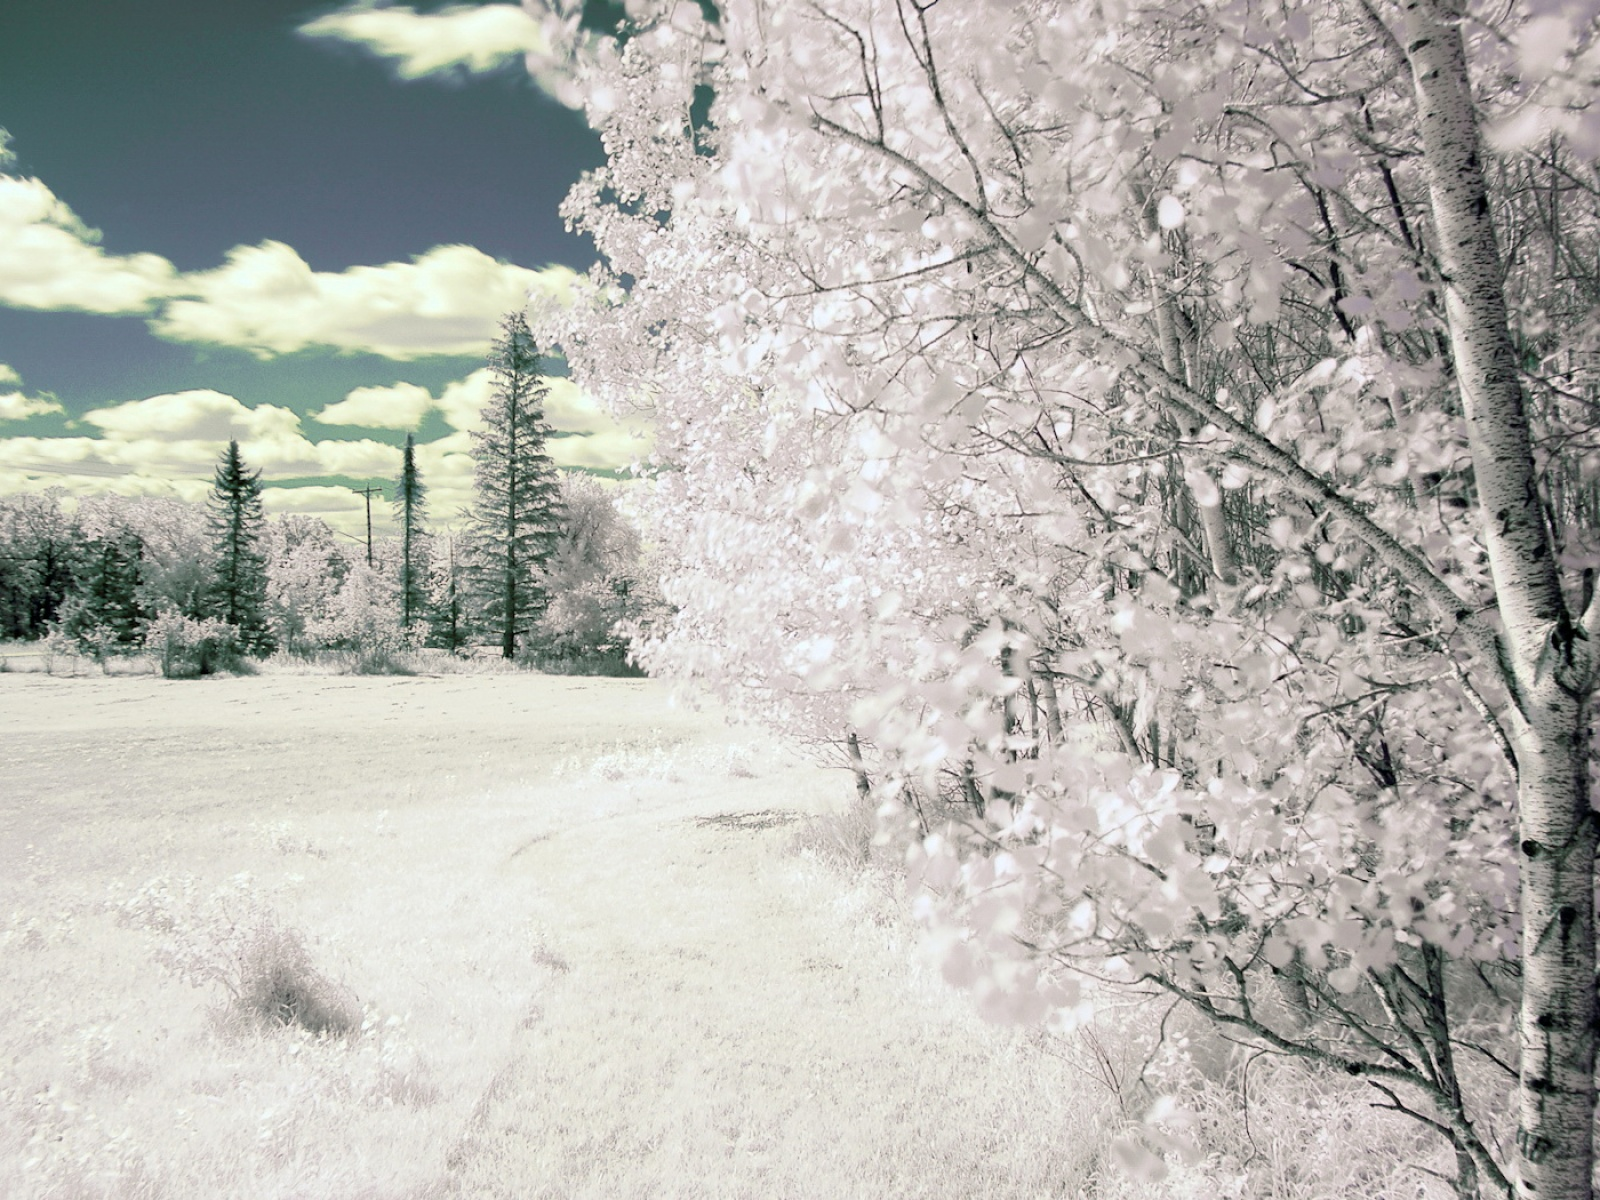 Scenery wallpaper fond ecran gratuit paysage d 39 hiver for Fond ecran gratuit hiver